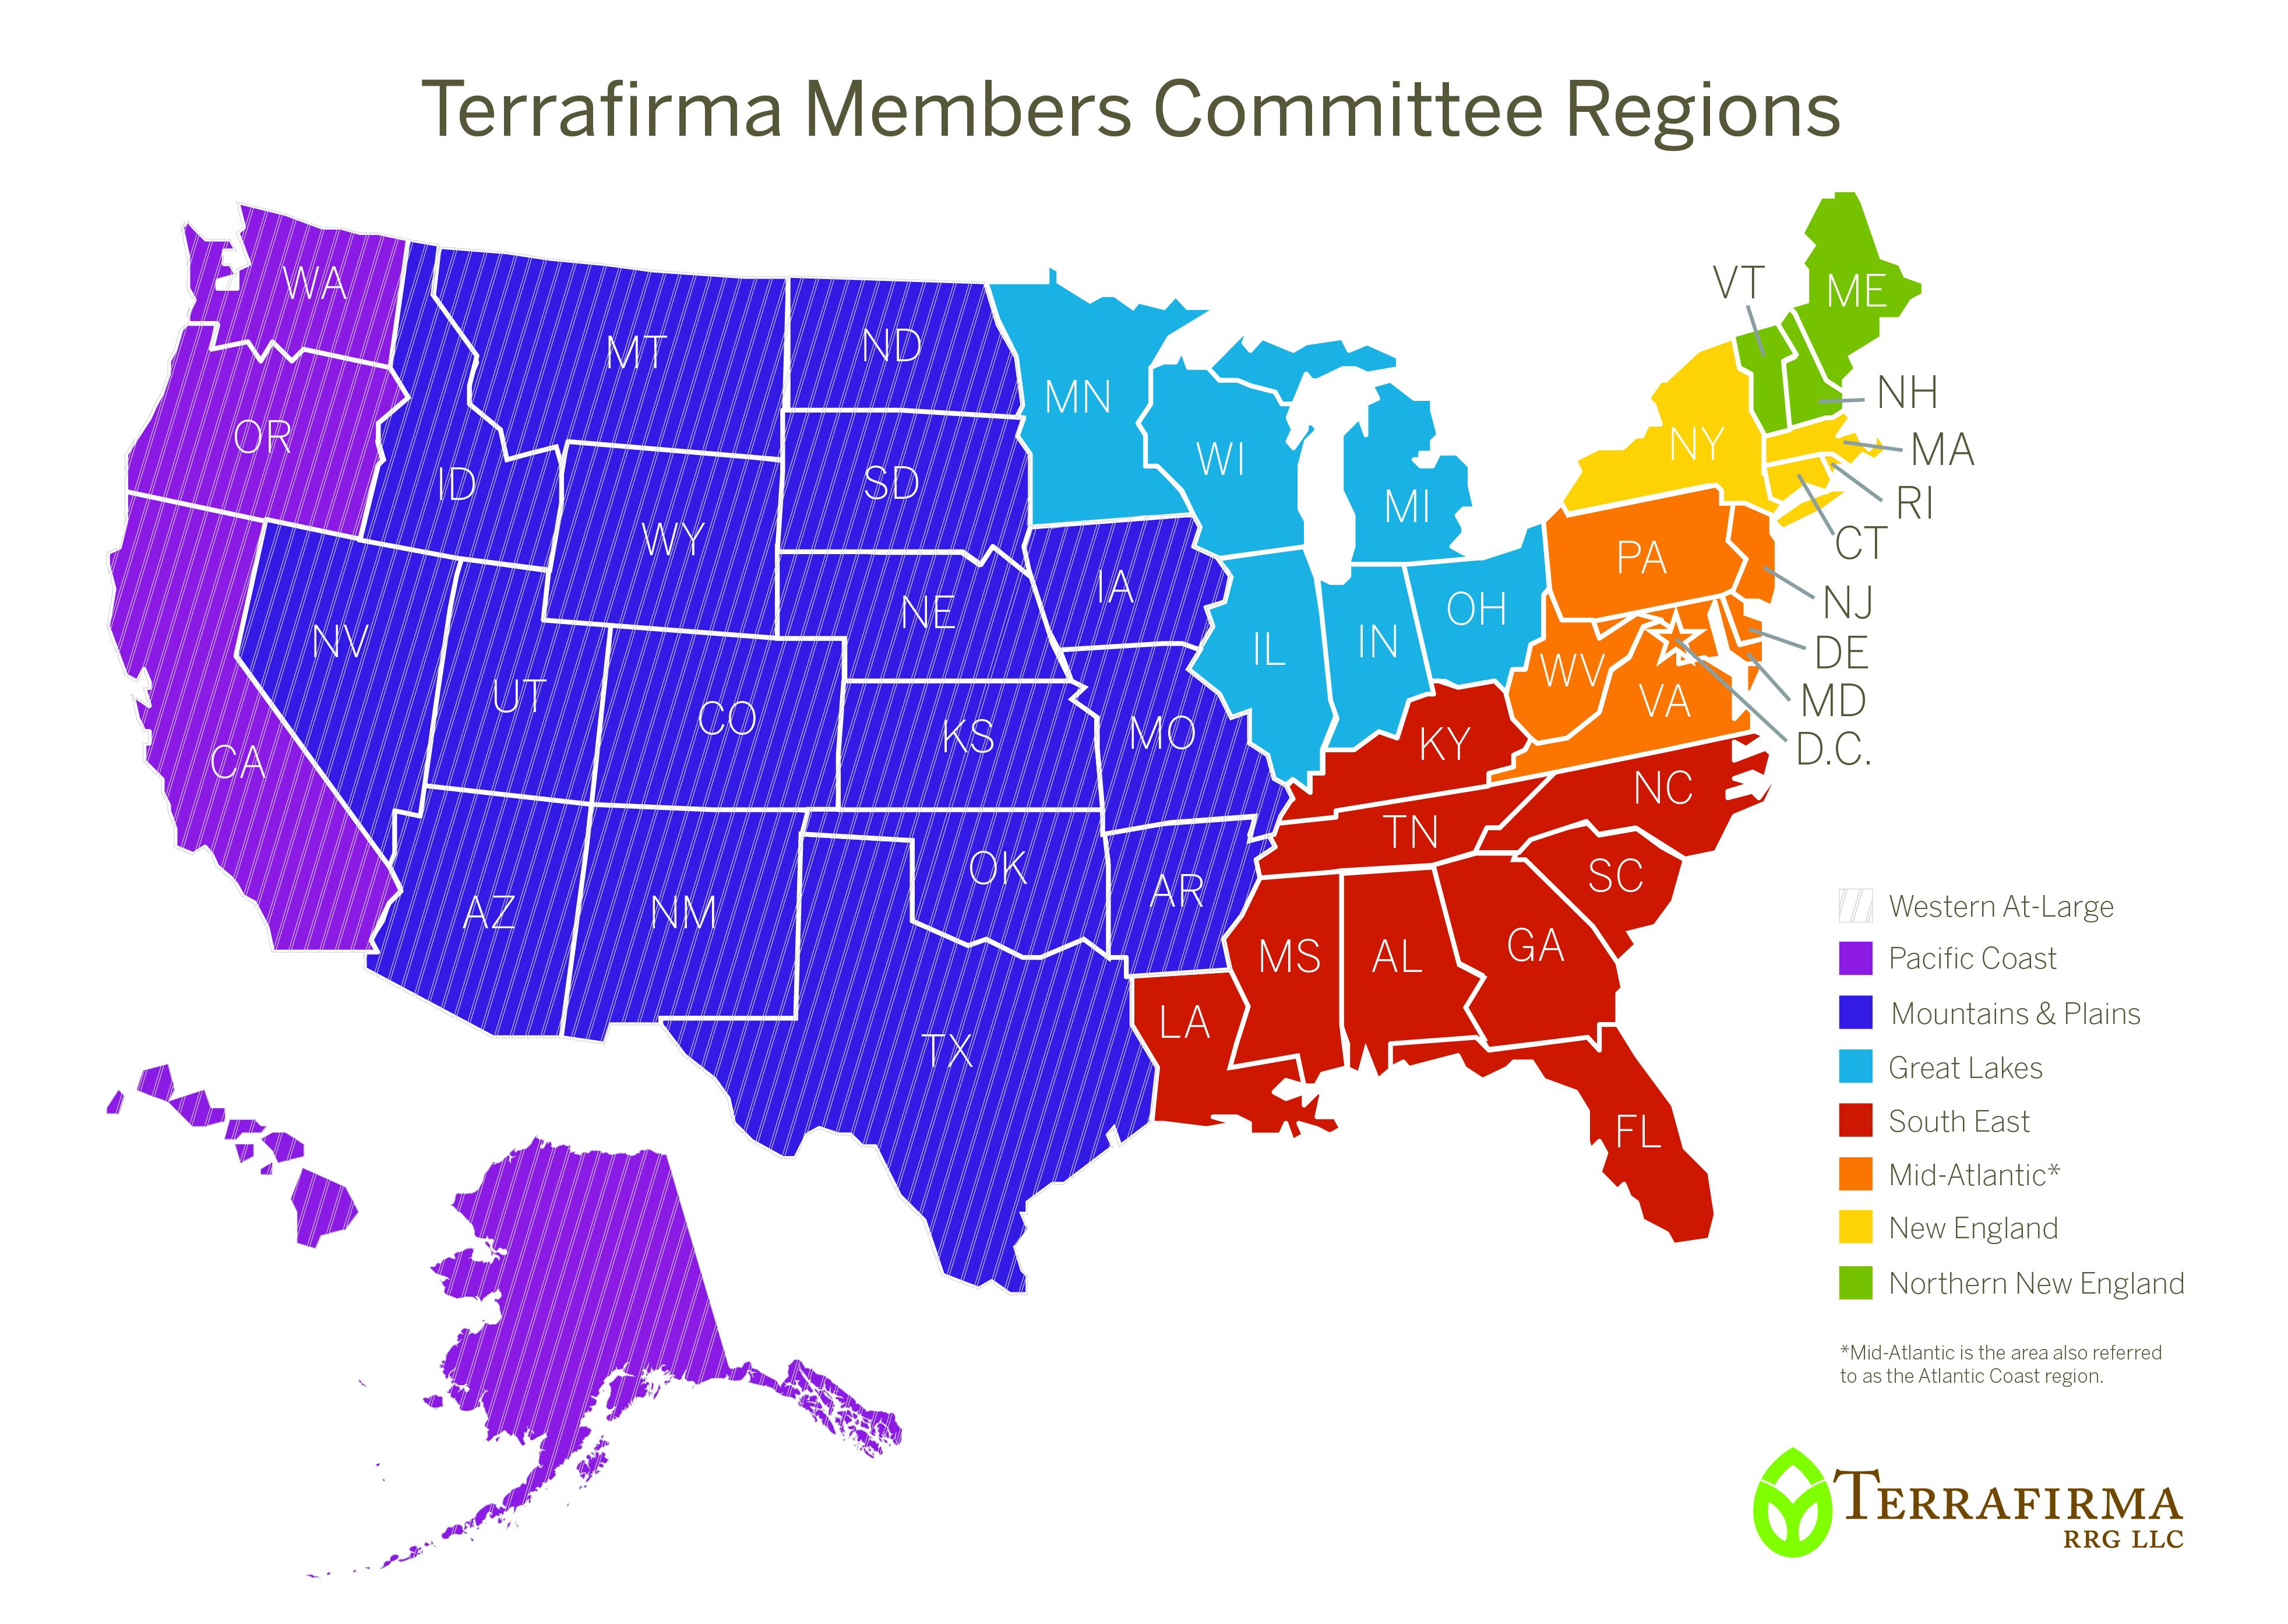 Us Land Regions Map Terrafirma